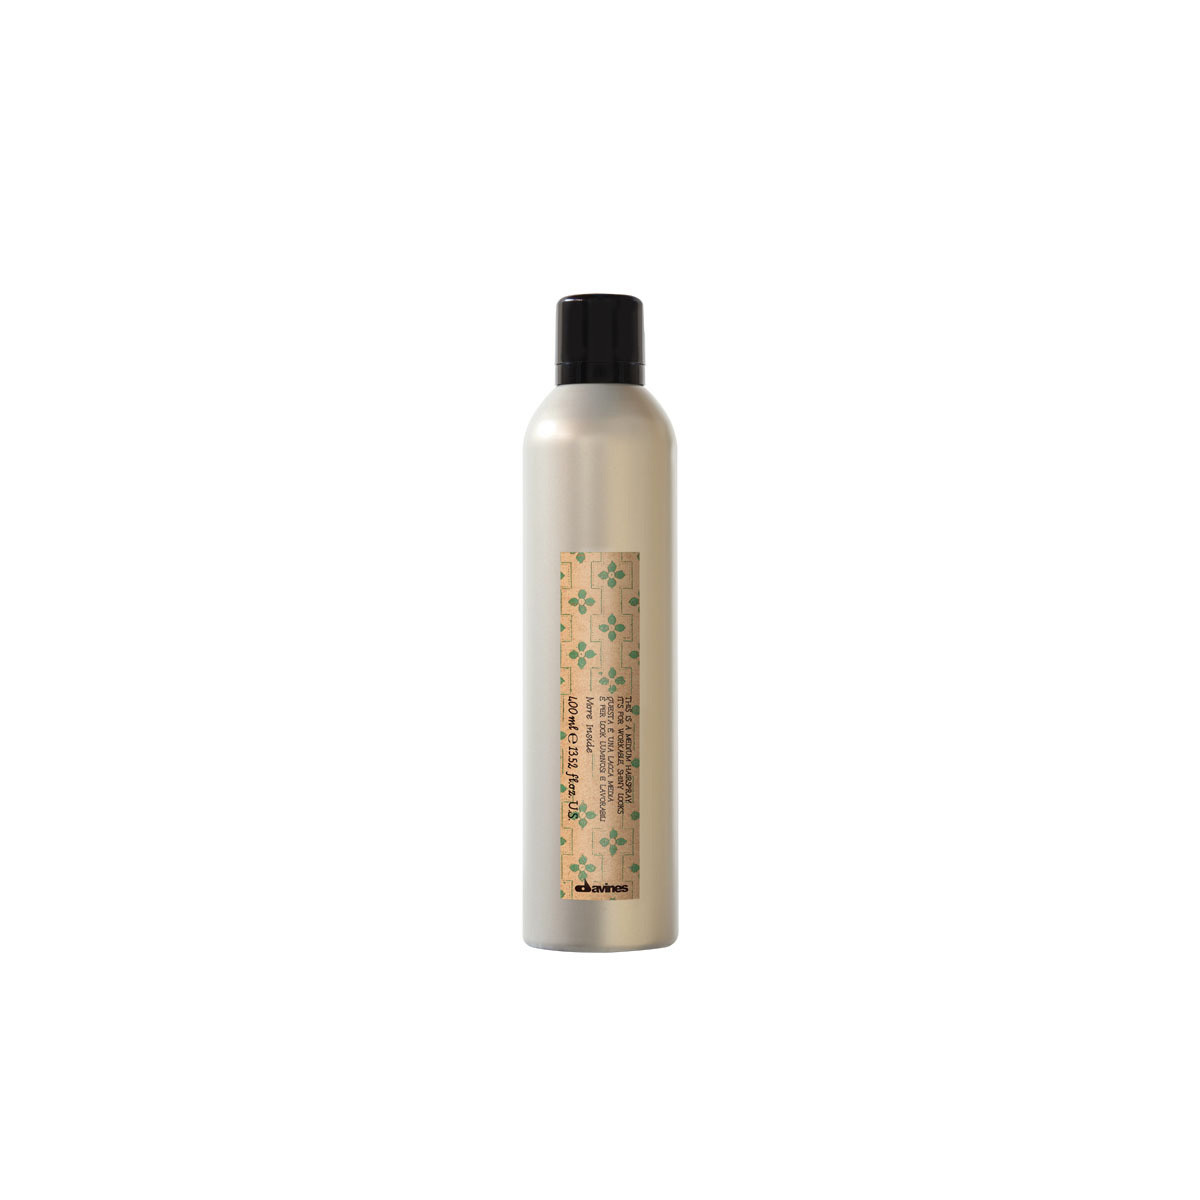 Davines This is a Medium Hairspray 250 ml   Spray Fijación Media